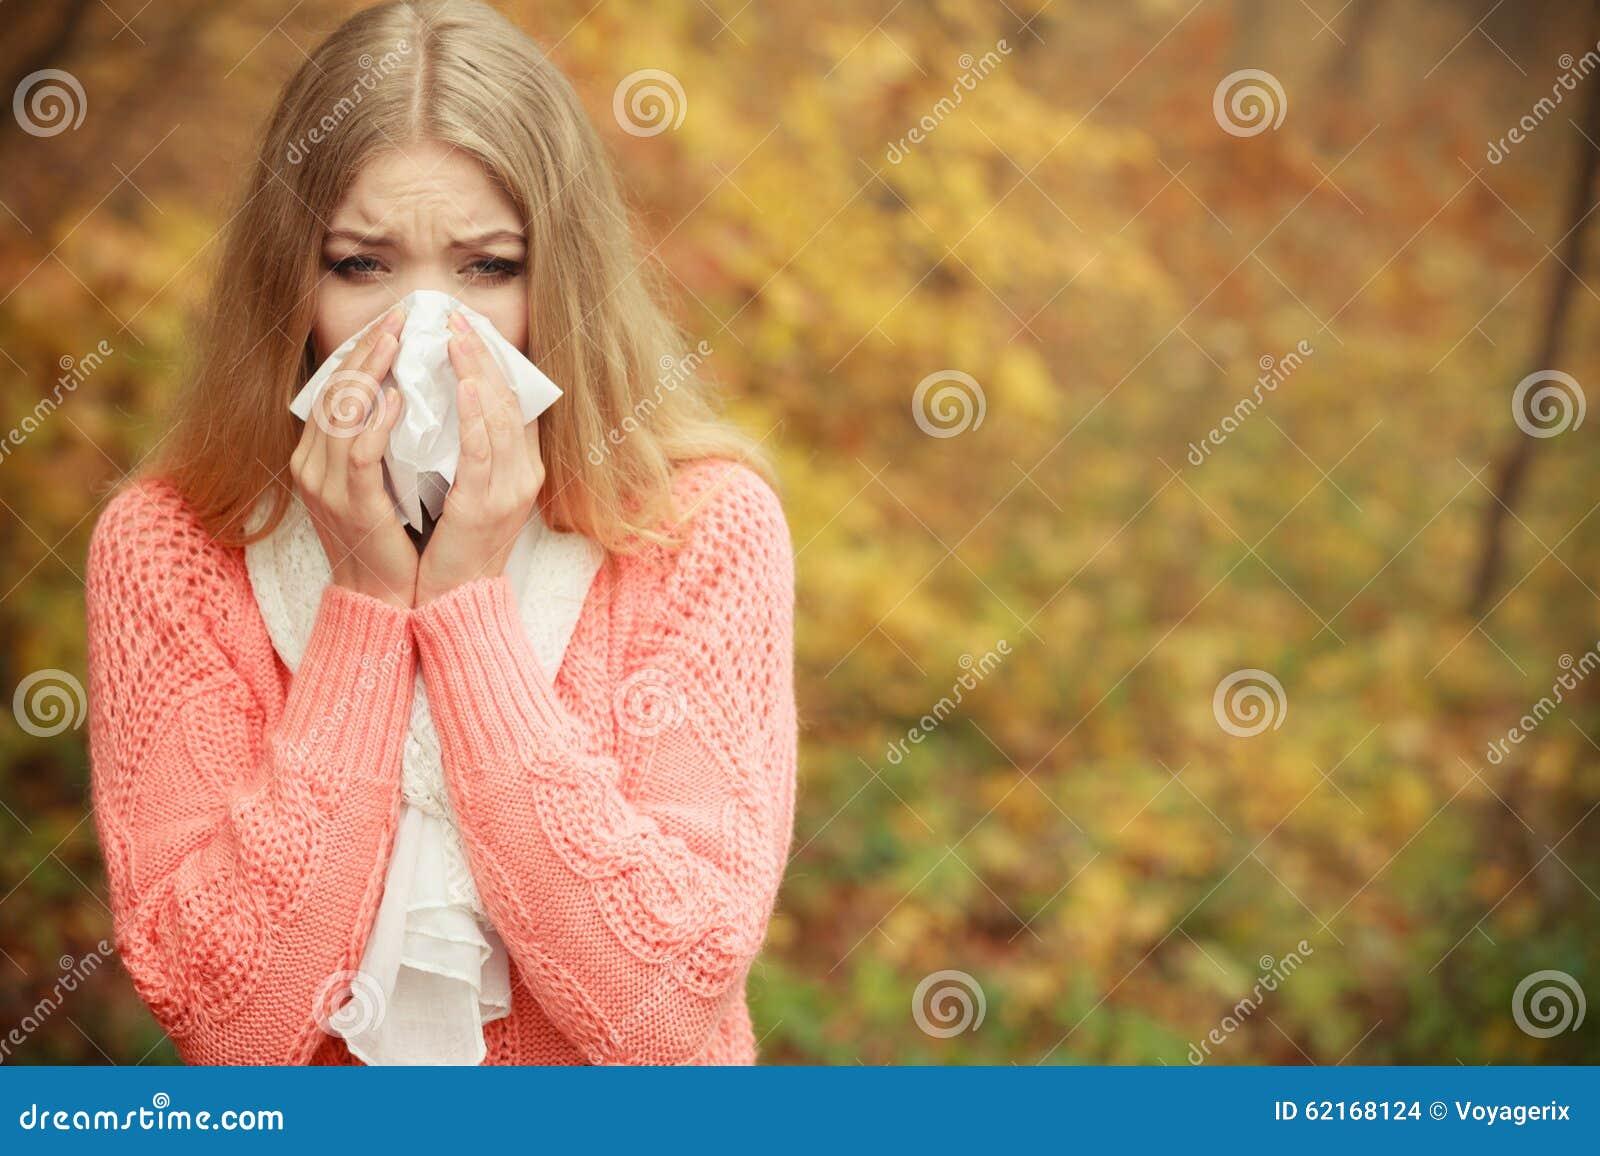 Sick Ill Woman In Autumn Park Sneezing In Tissue Stock